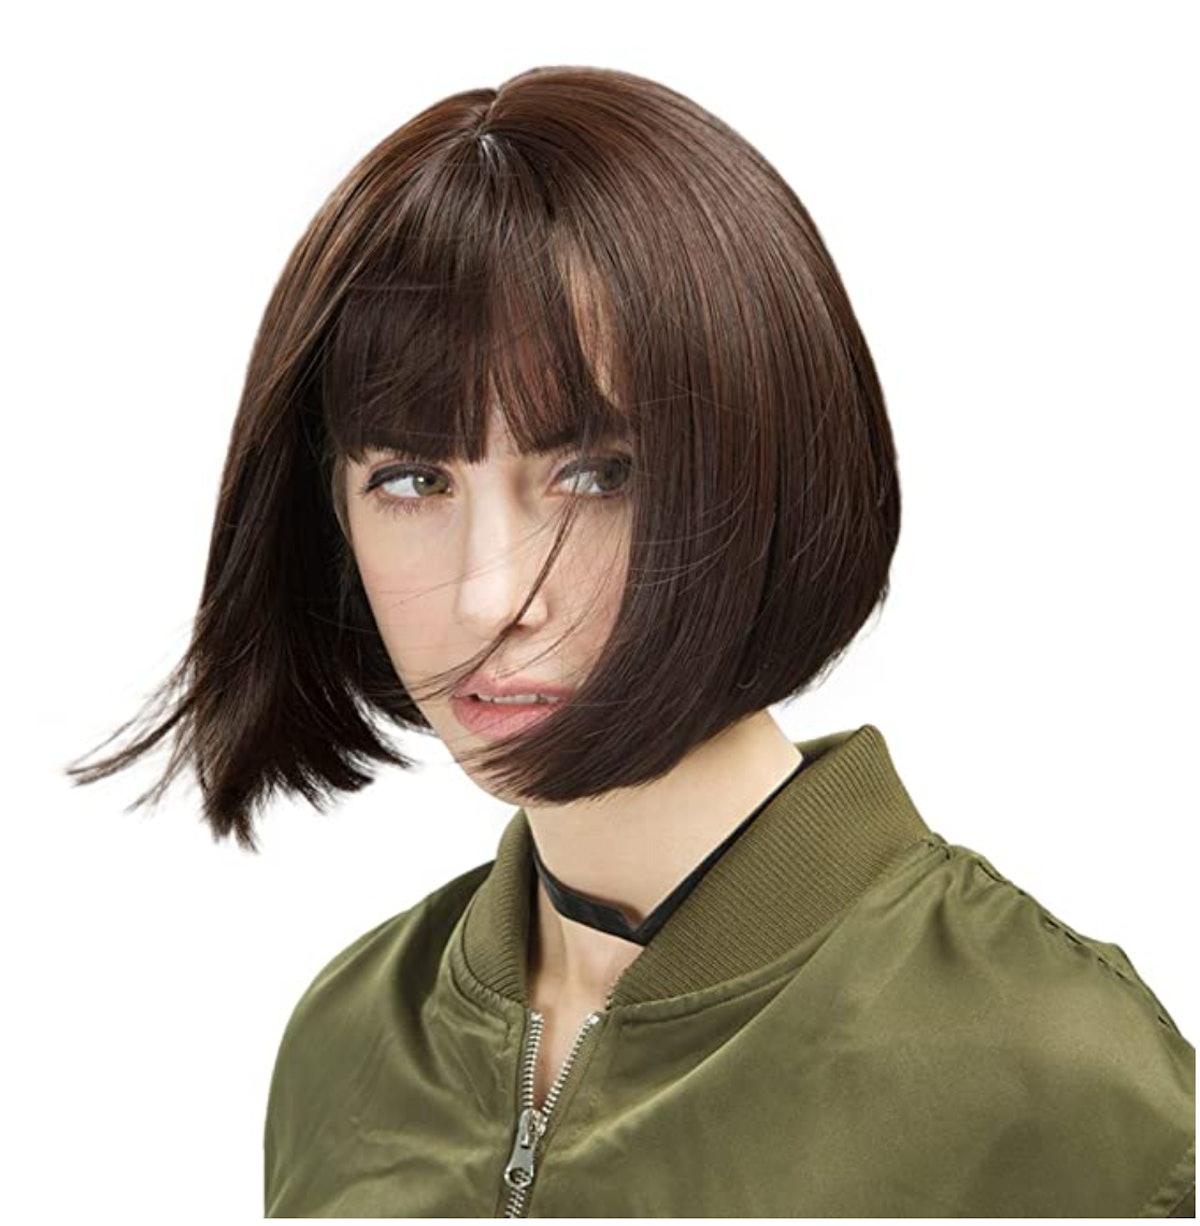 "REECHO 11"" Short Bob Wig with Bangs Synthetic Hair Color: Dark brown"